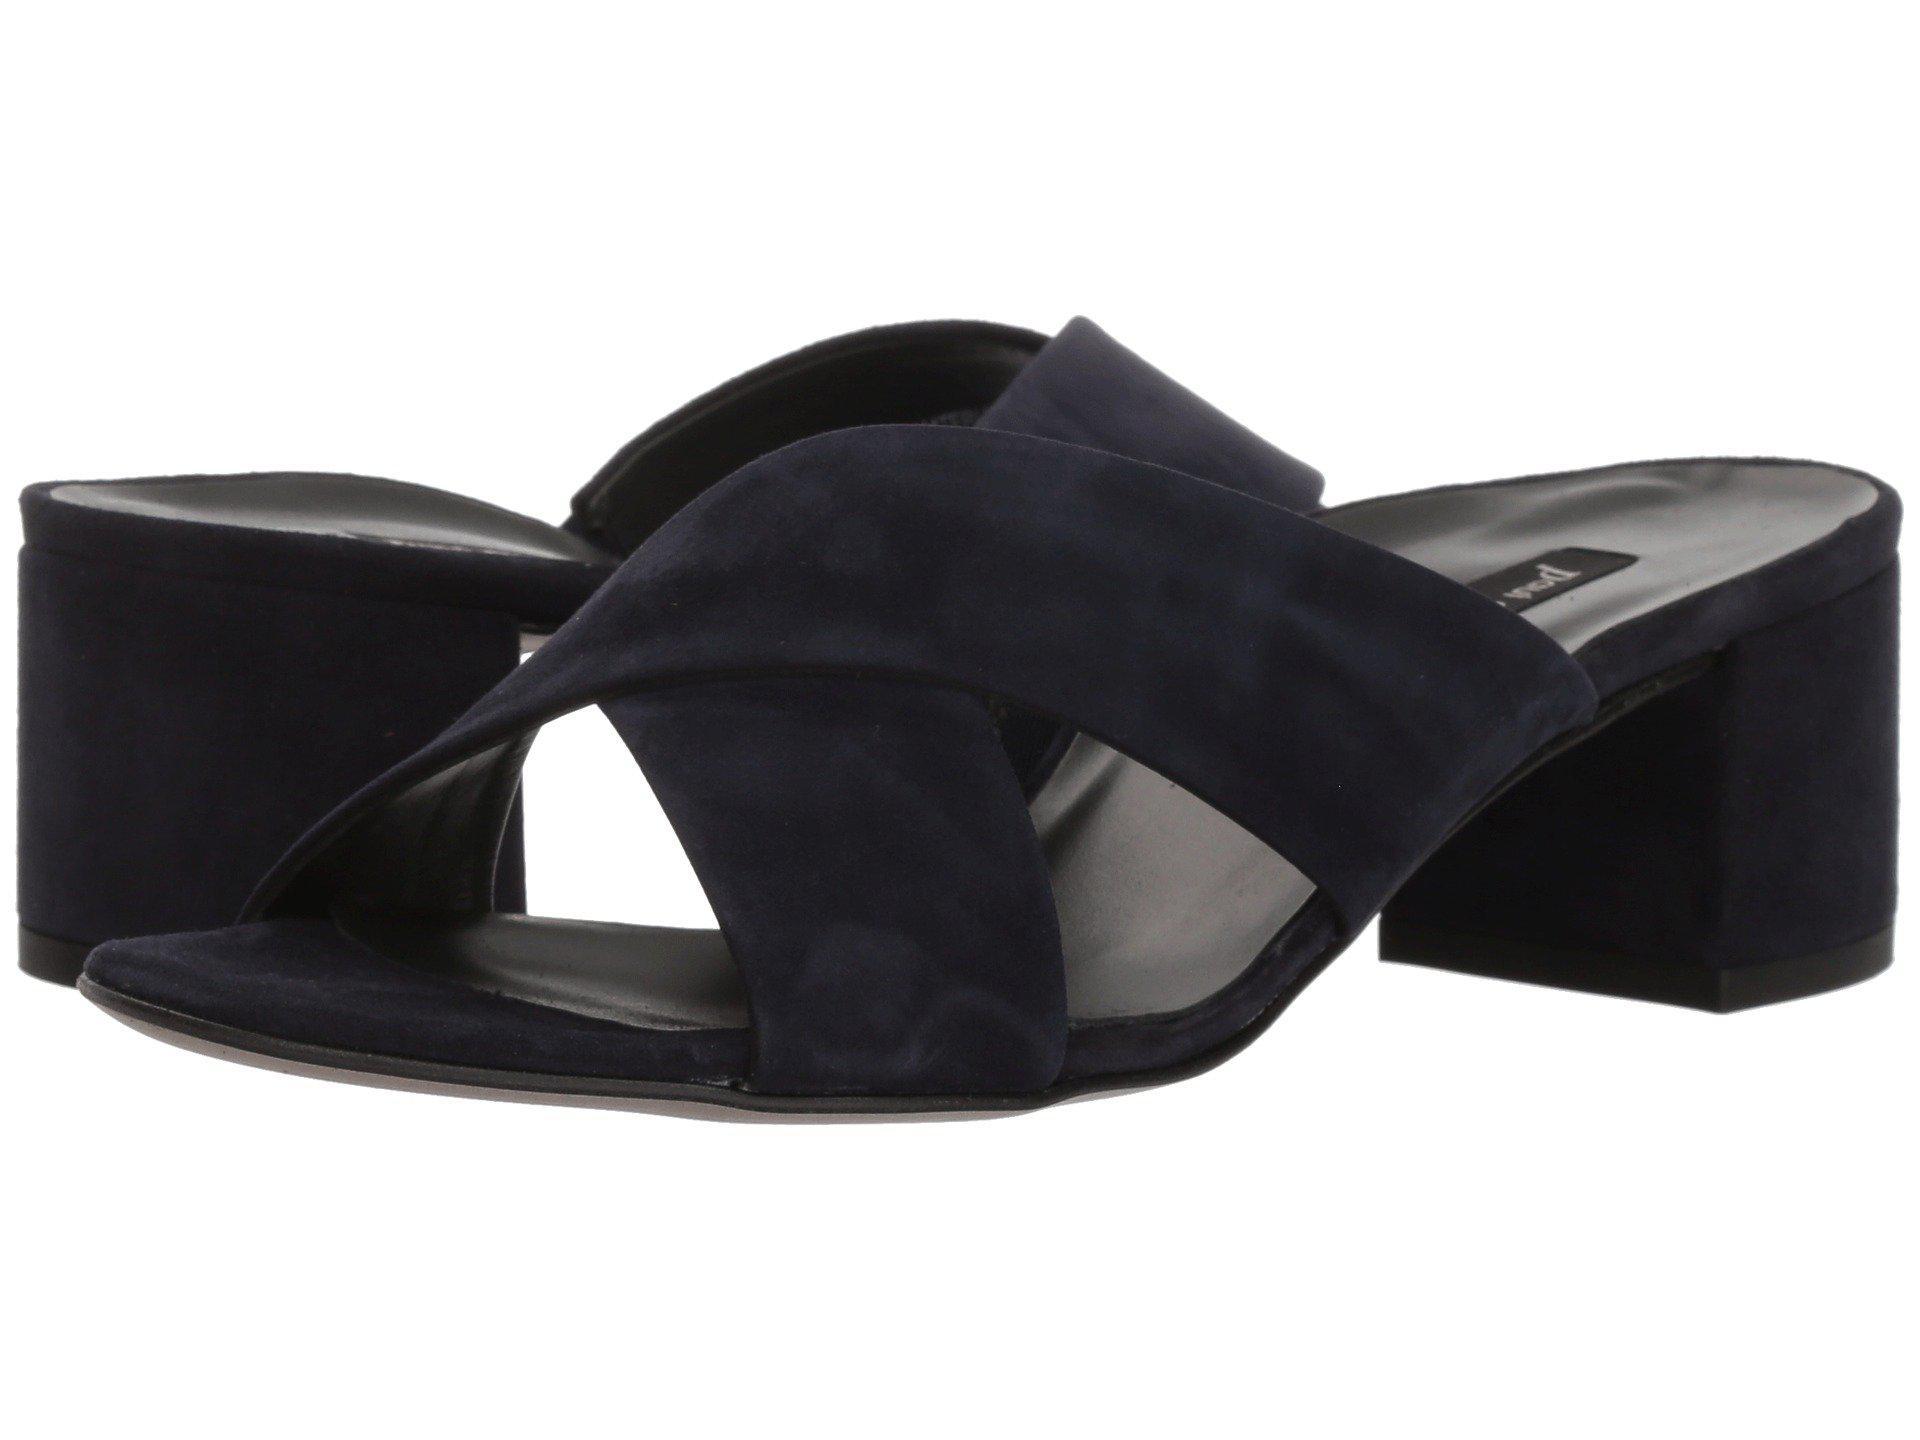 Sandale Paul Coût Z1LwbAUFM